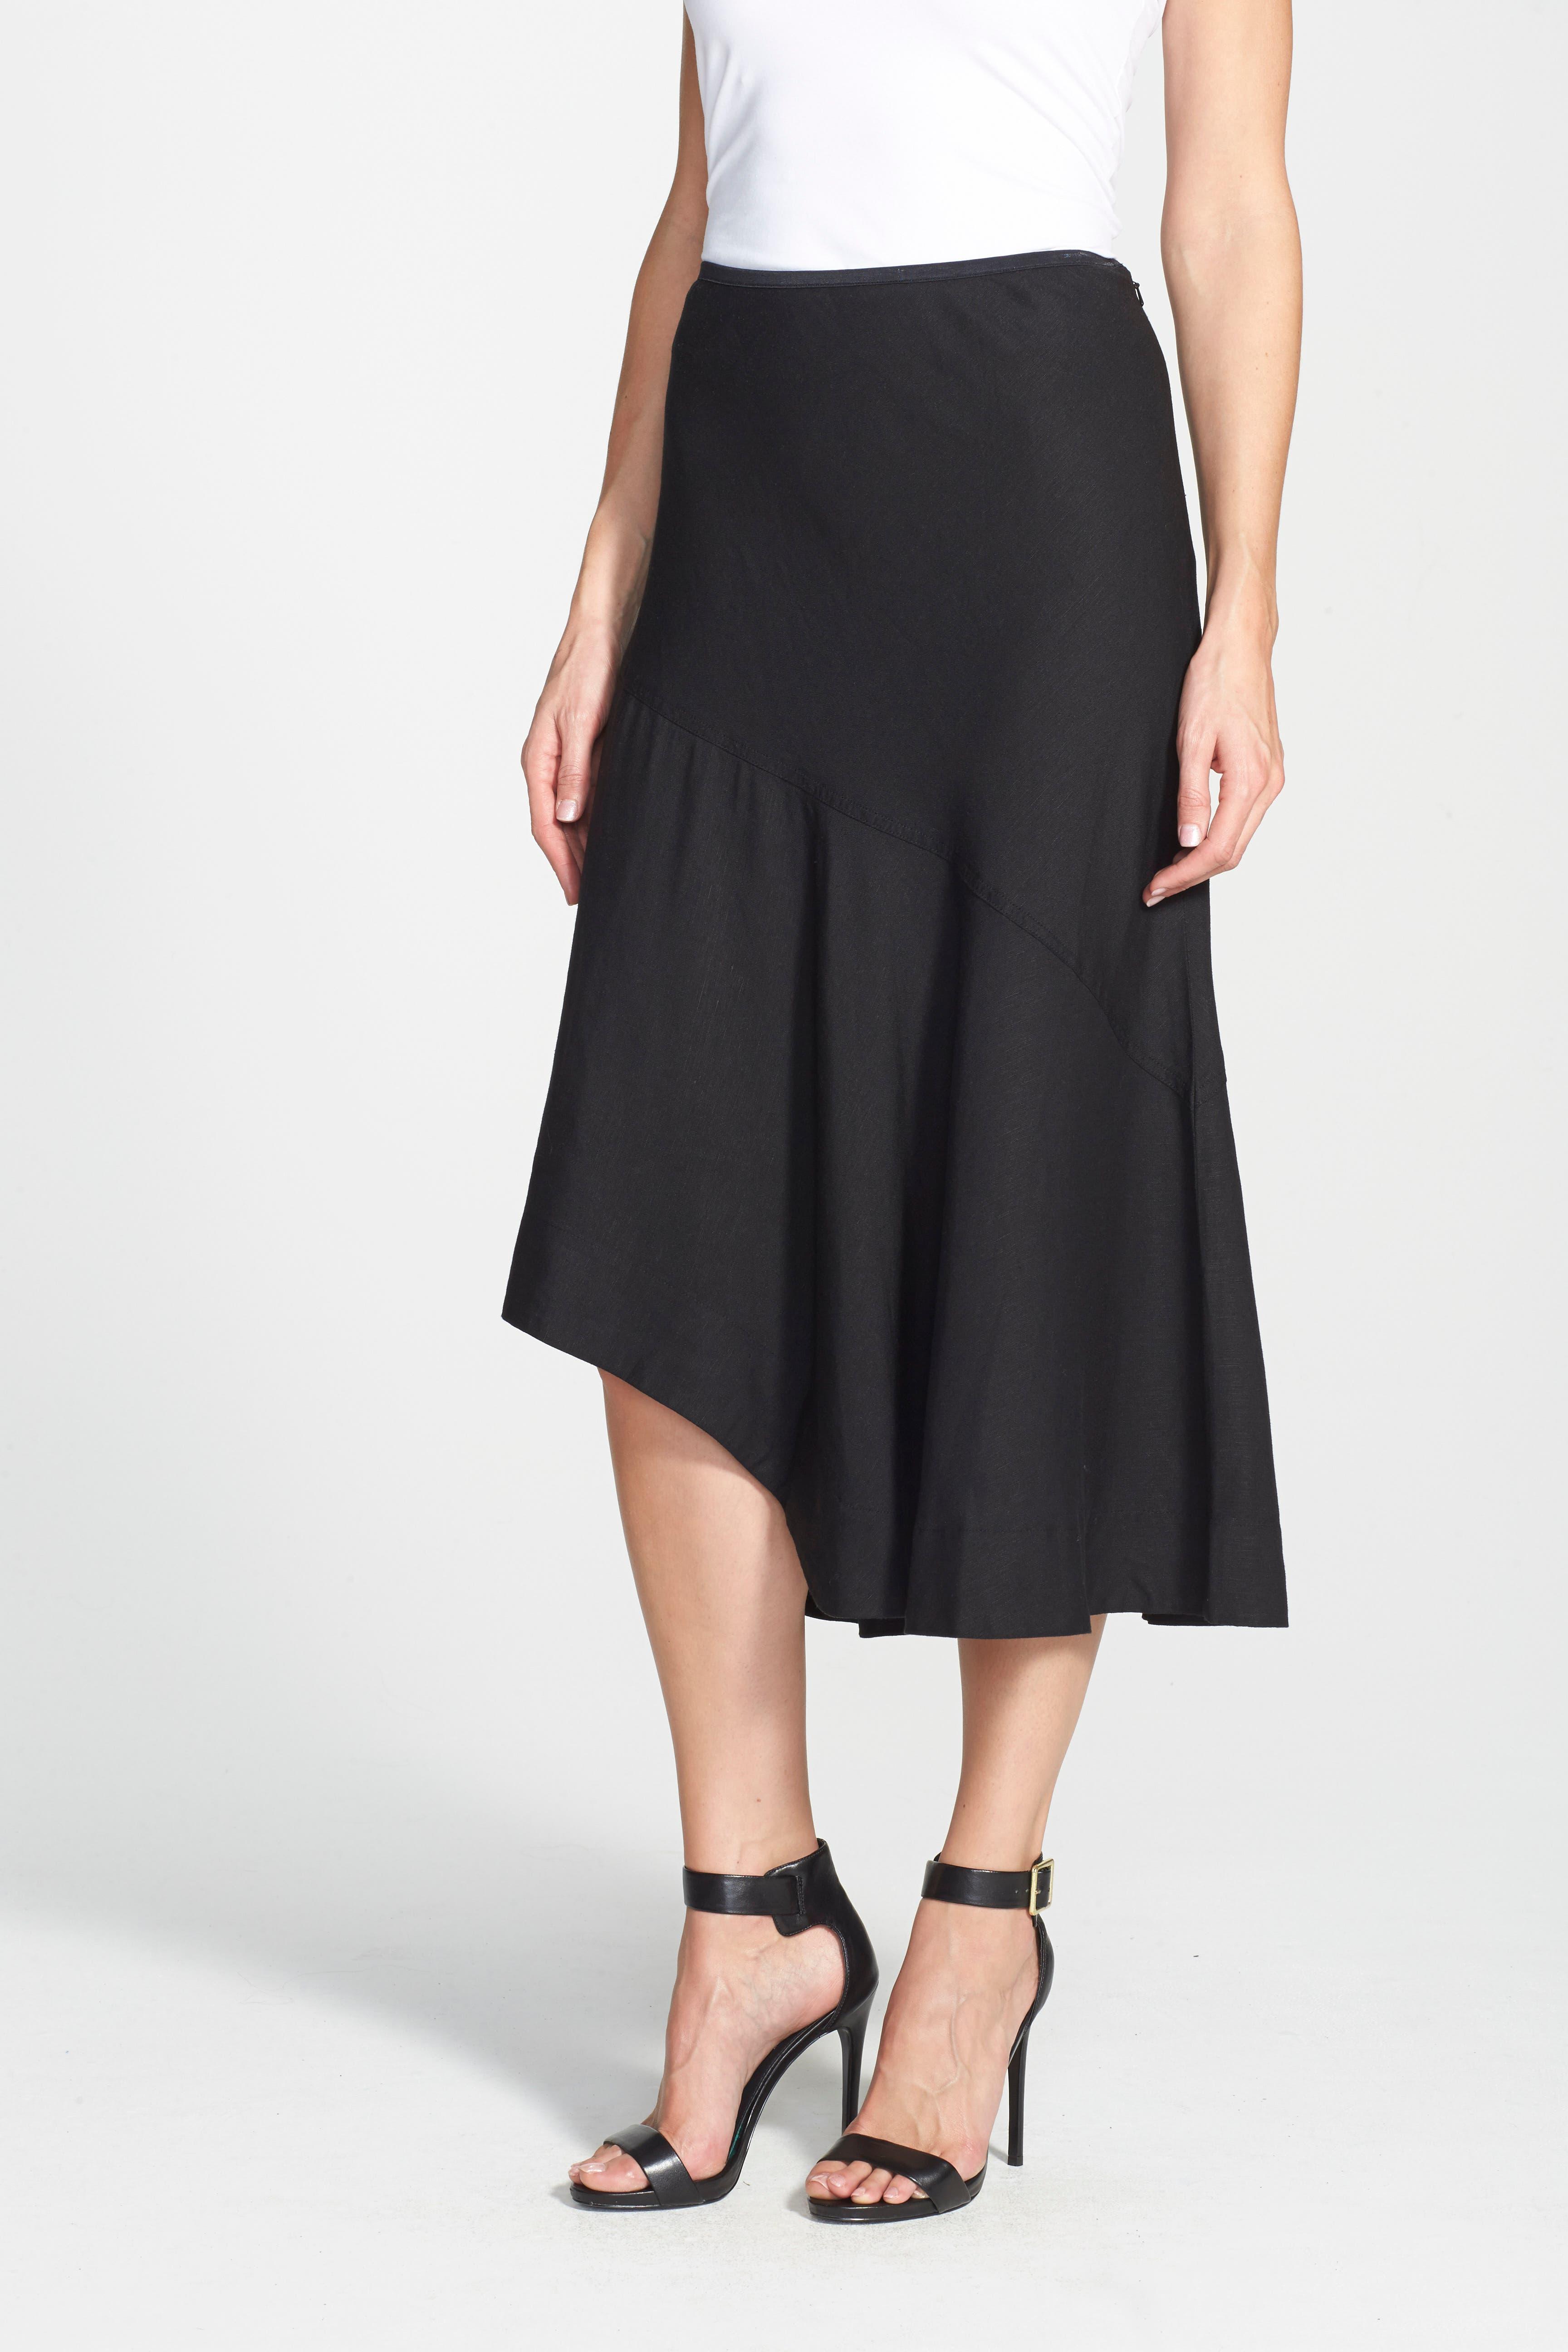 NIC+ZOE,                             'The Long Engagement' Midi Skirt,                             Alternate thumbnail 3, color,                             004